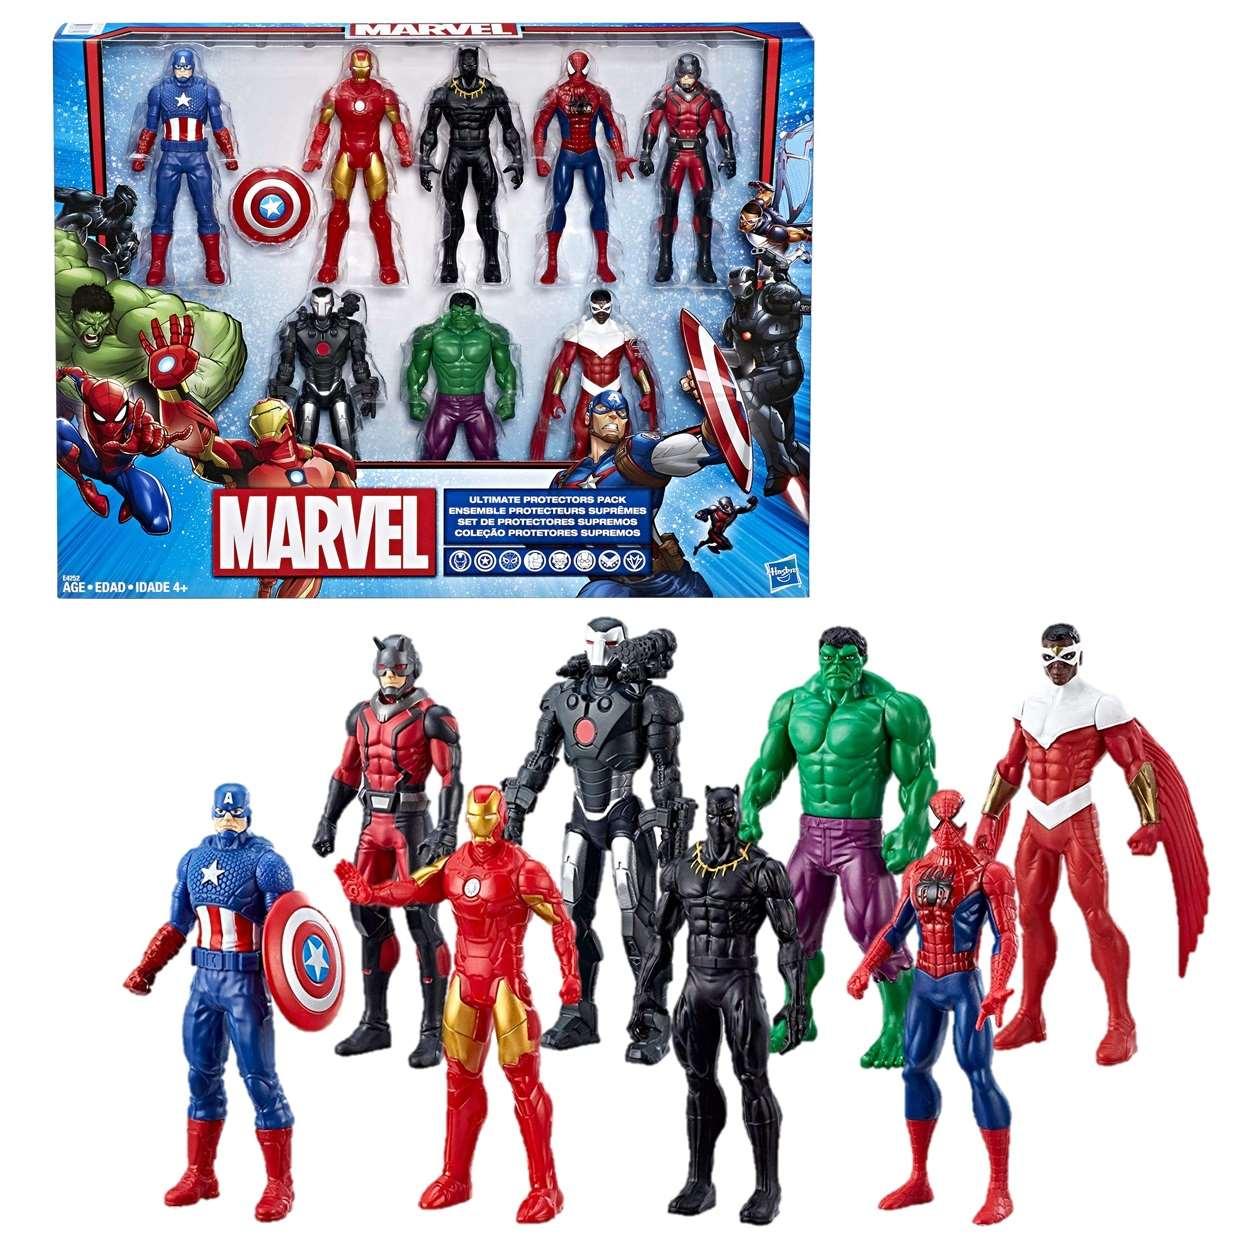 Paquete 8 Figuras Hasbro Marvel Ultimate Protectors 6 PuLG